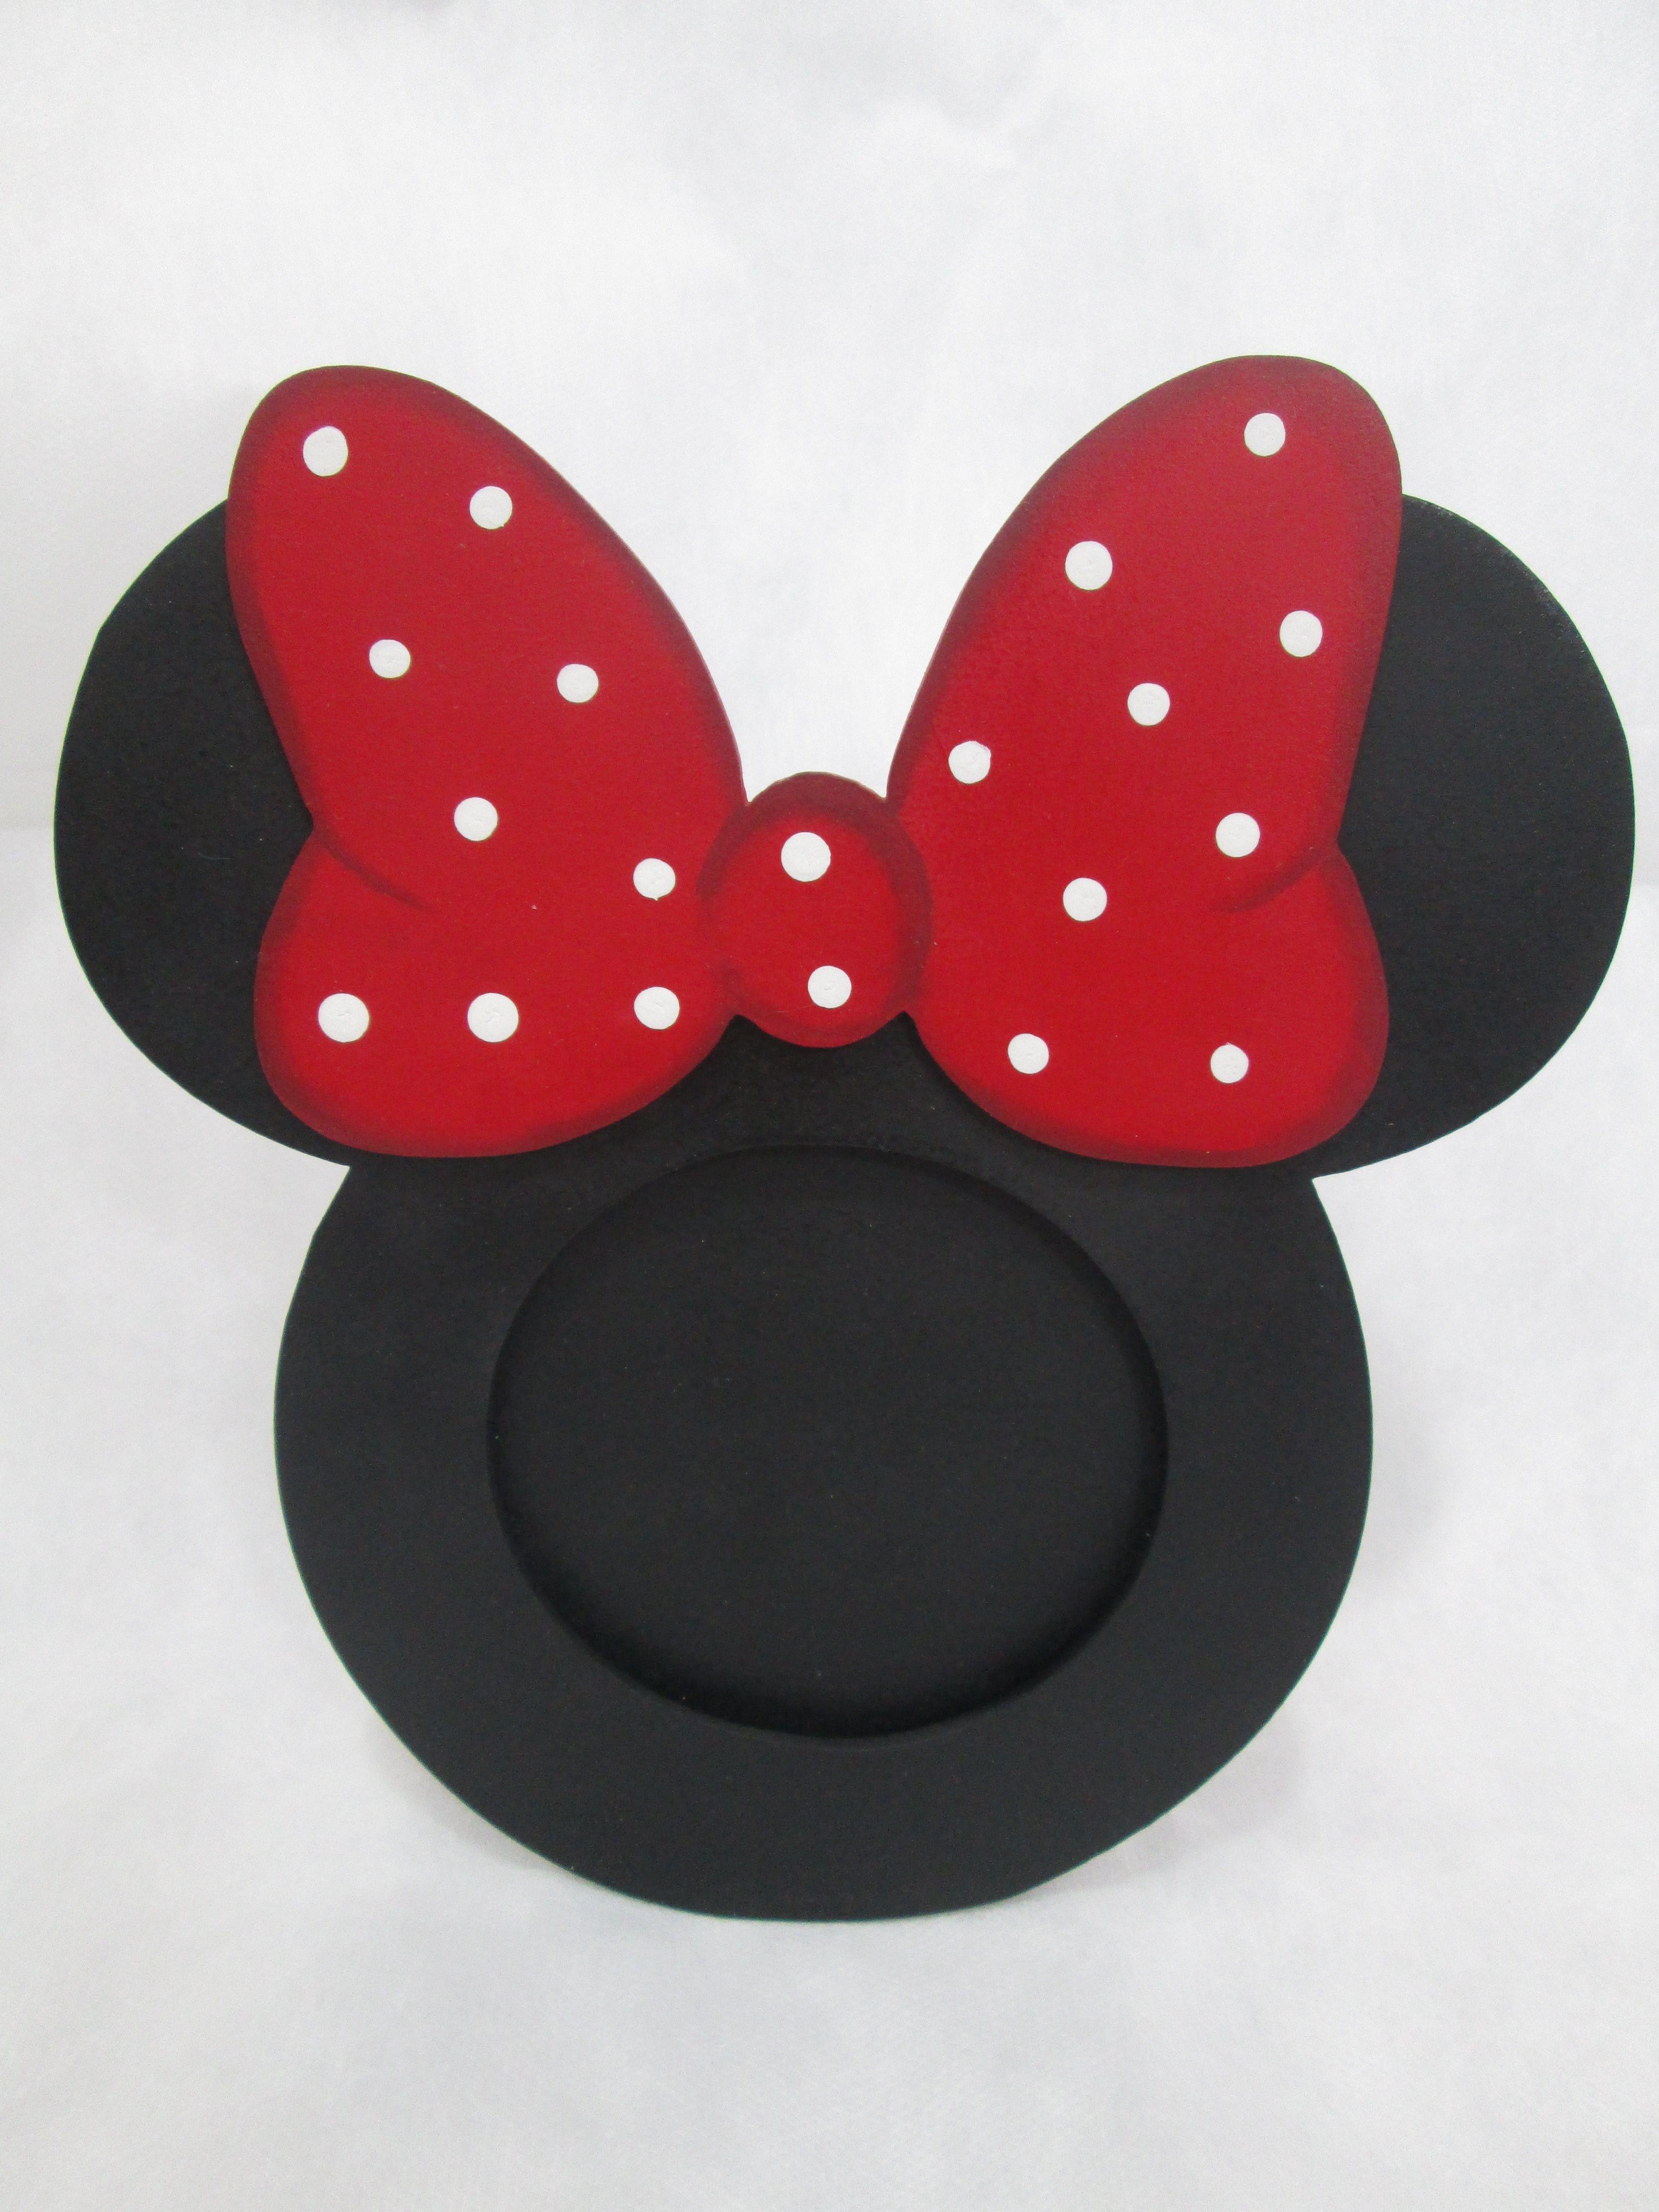 minnie mouse en goma eva - Buscar con Google | Disney | Pinterest ...